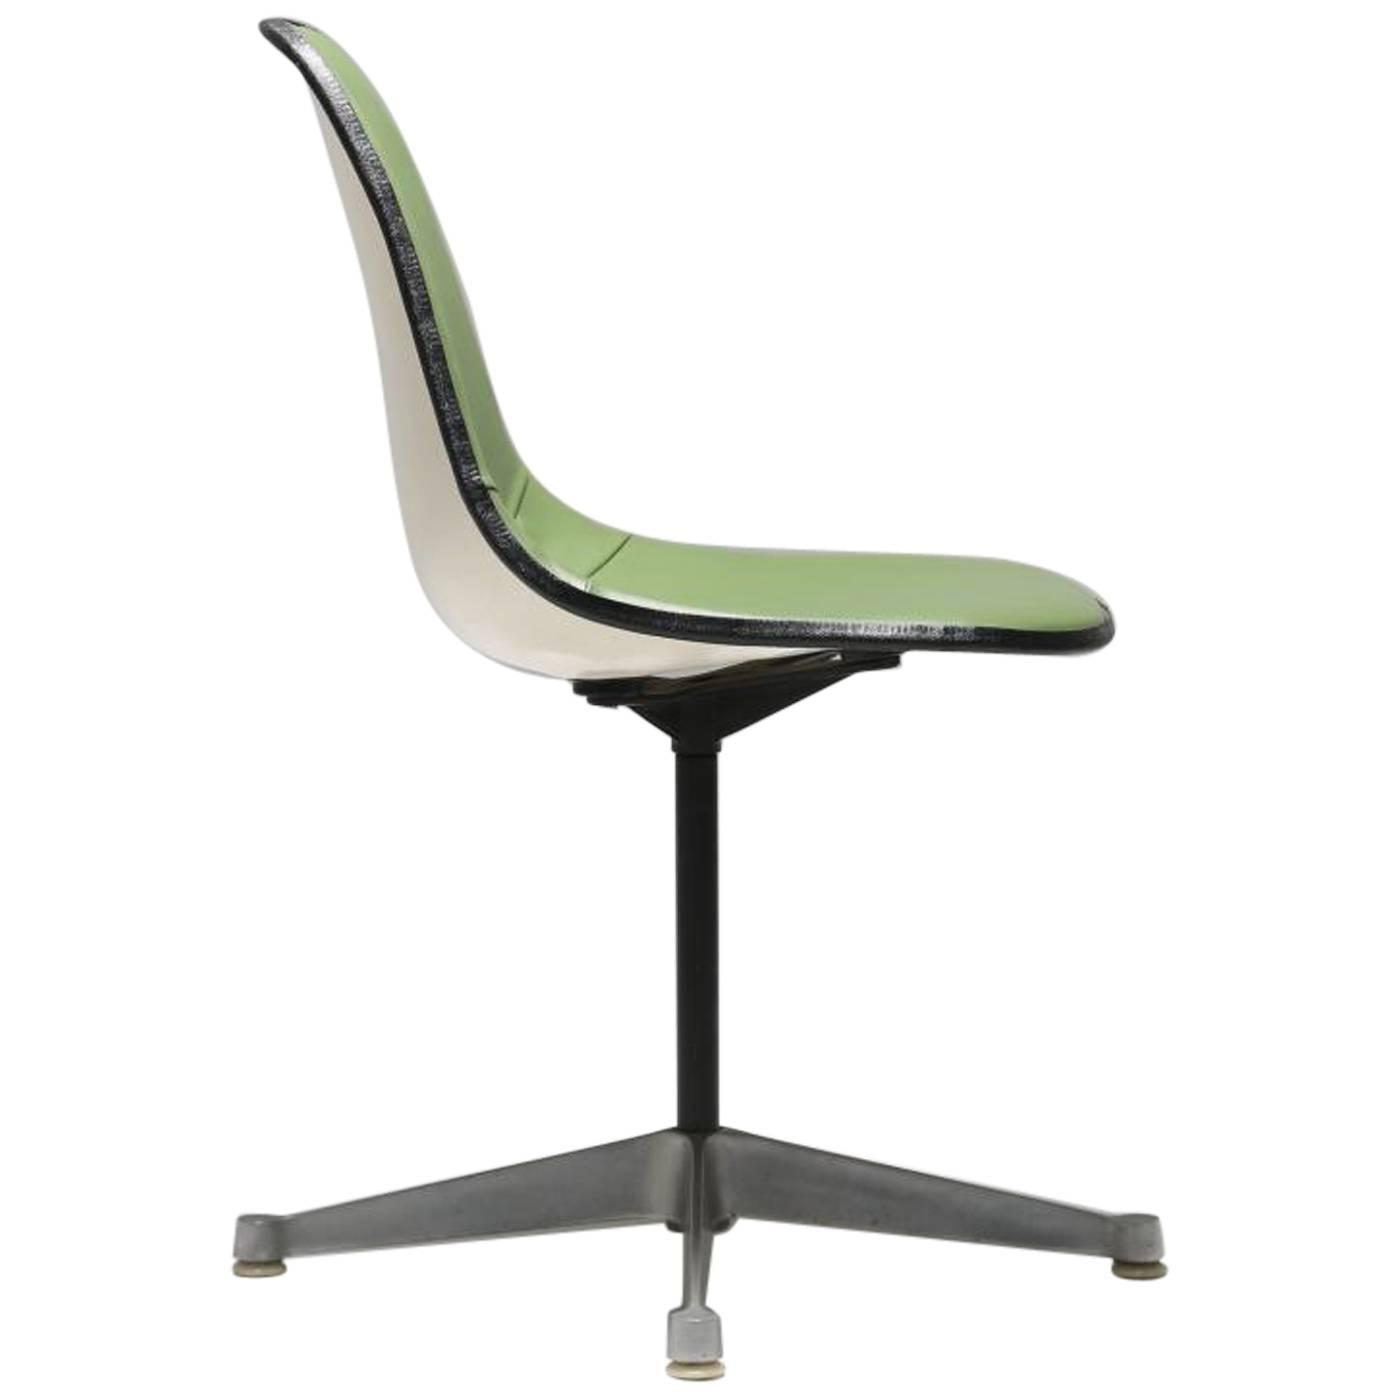 Herman miller psc swivel office chair at 1stdibs - Herman miller home office furniture ...